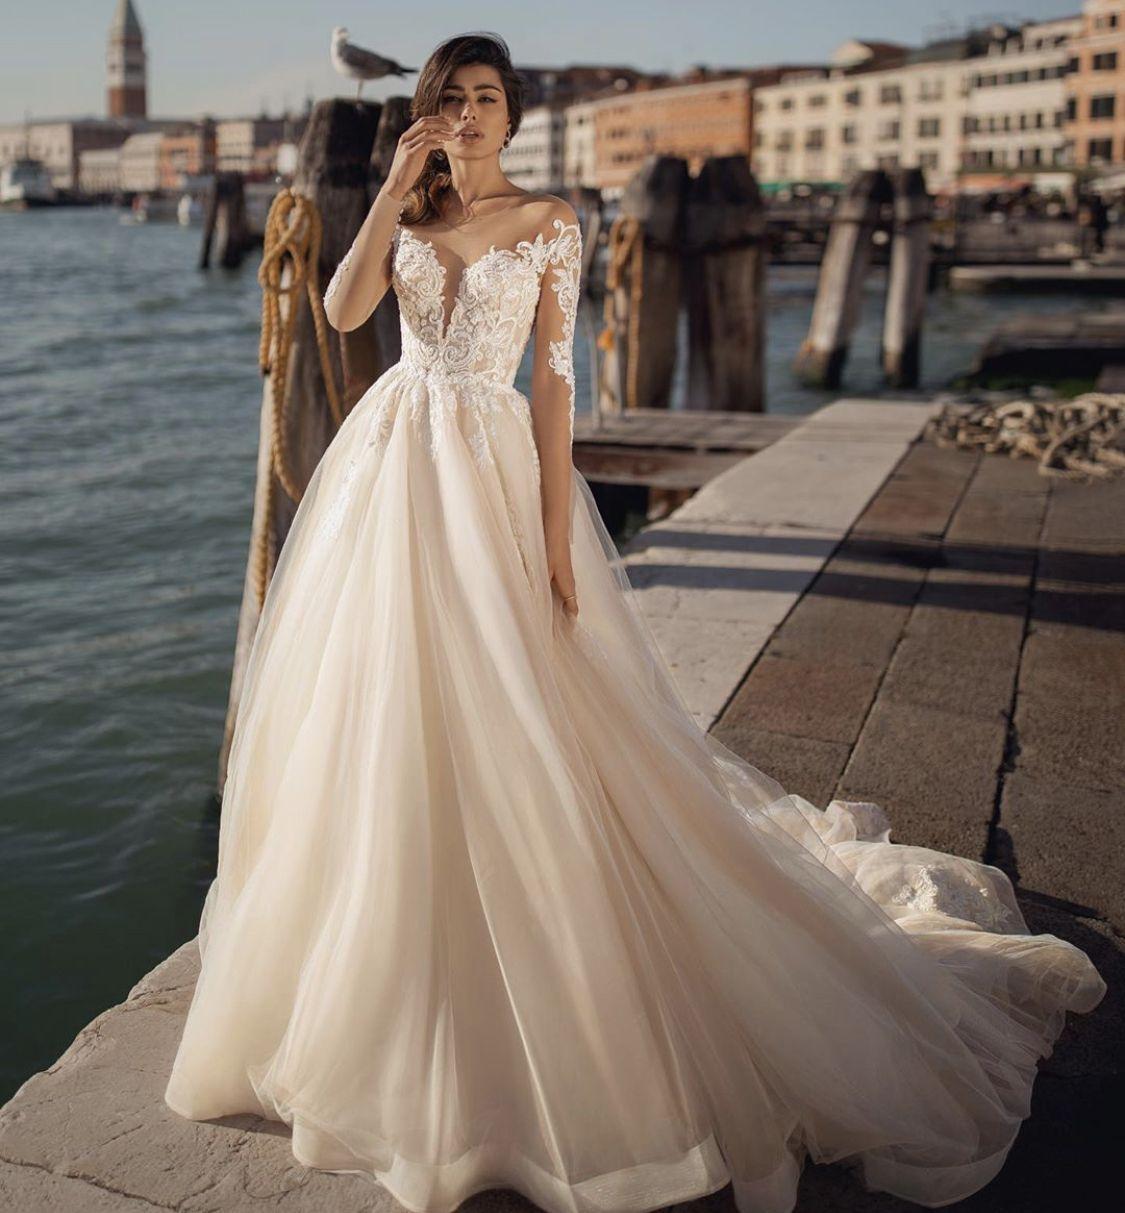 Viero Bridal In 2020 Wedding Dresses Wedding Dress Couture A Line Wedding Dress